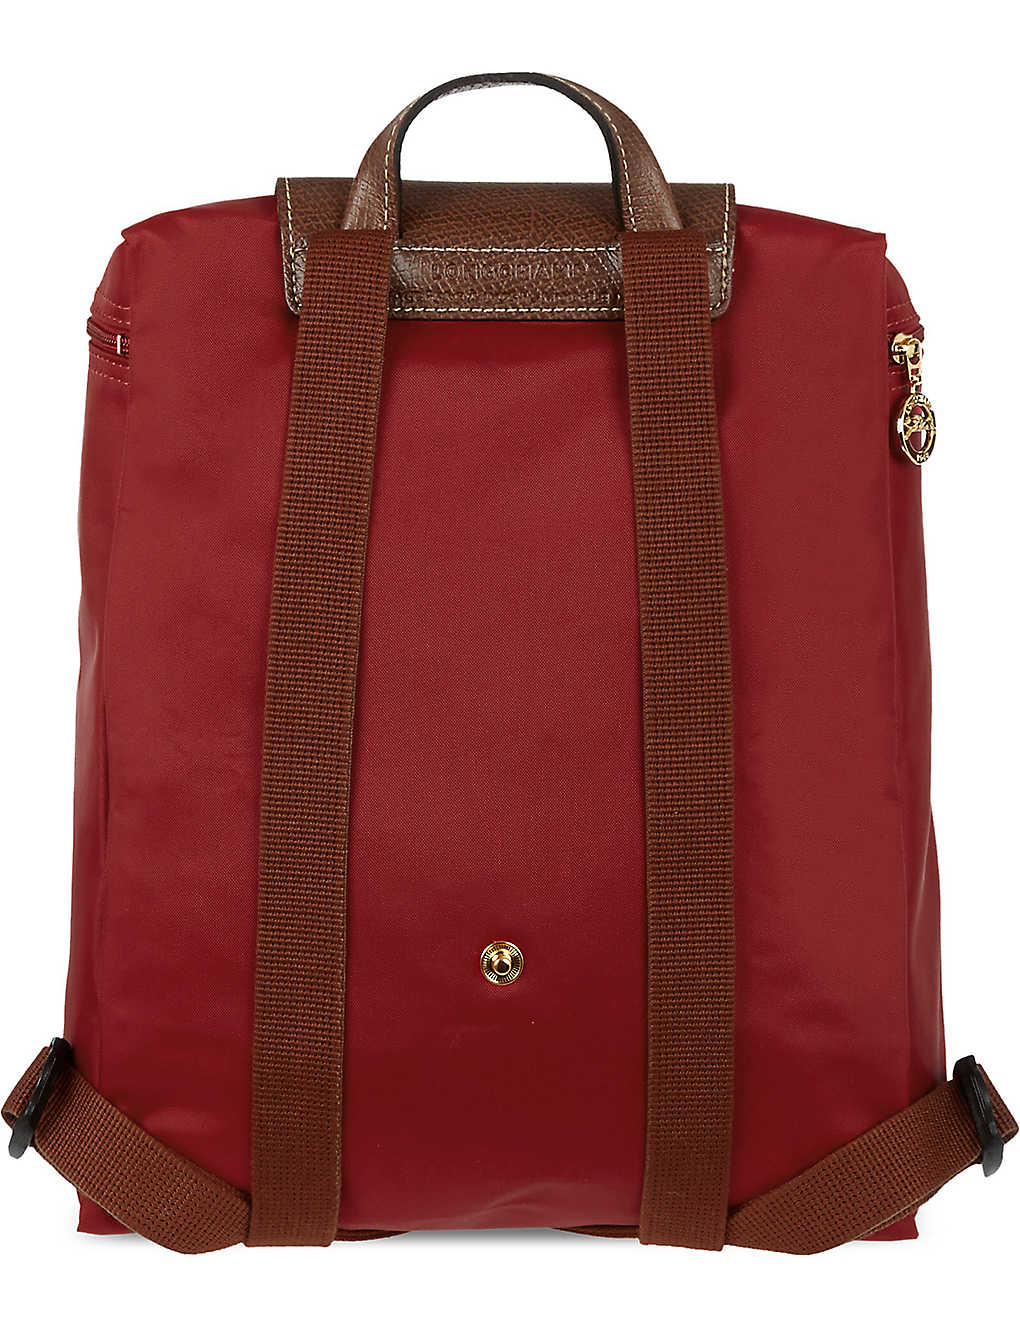 d22962995a0af ... Le Pliage backpack - Red ...